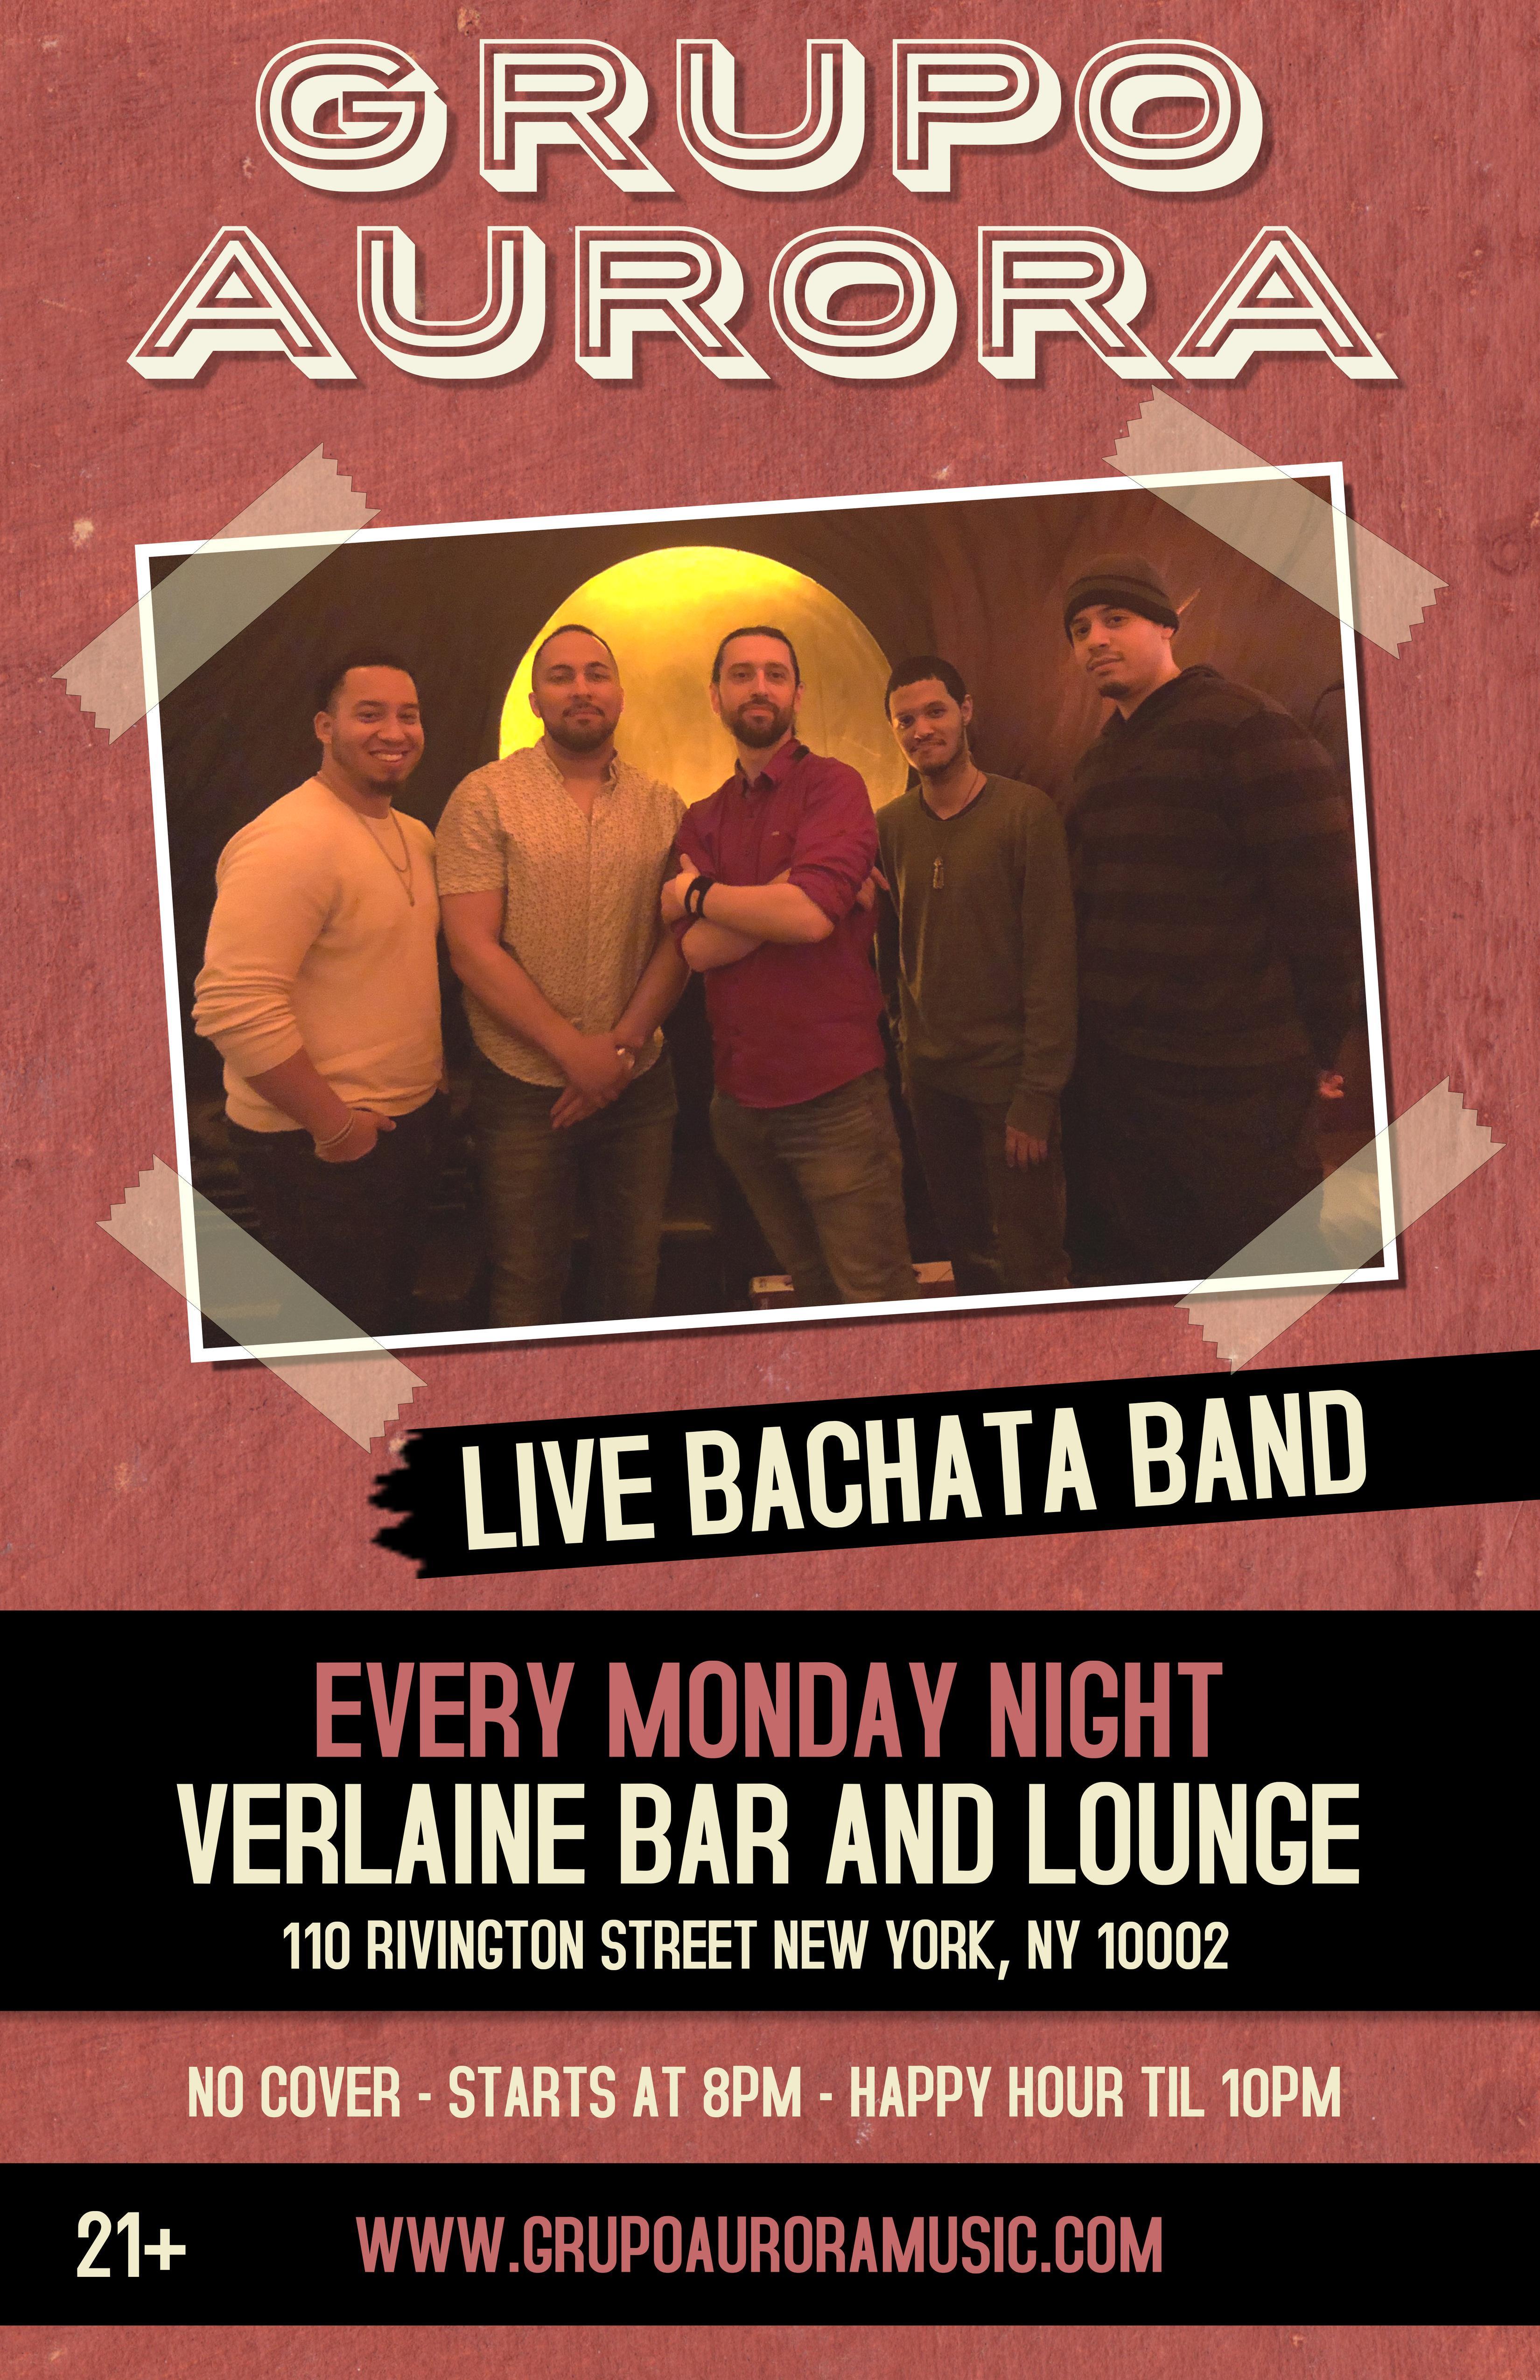 Live Bachata Band! Bachata Mondays with Grupo Aurora at Verlaine